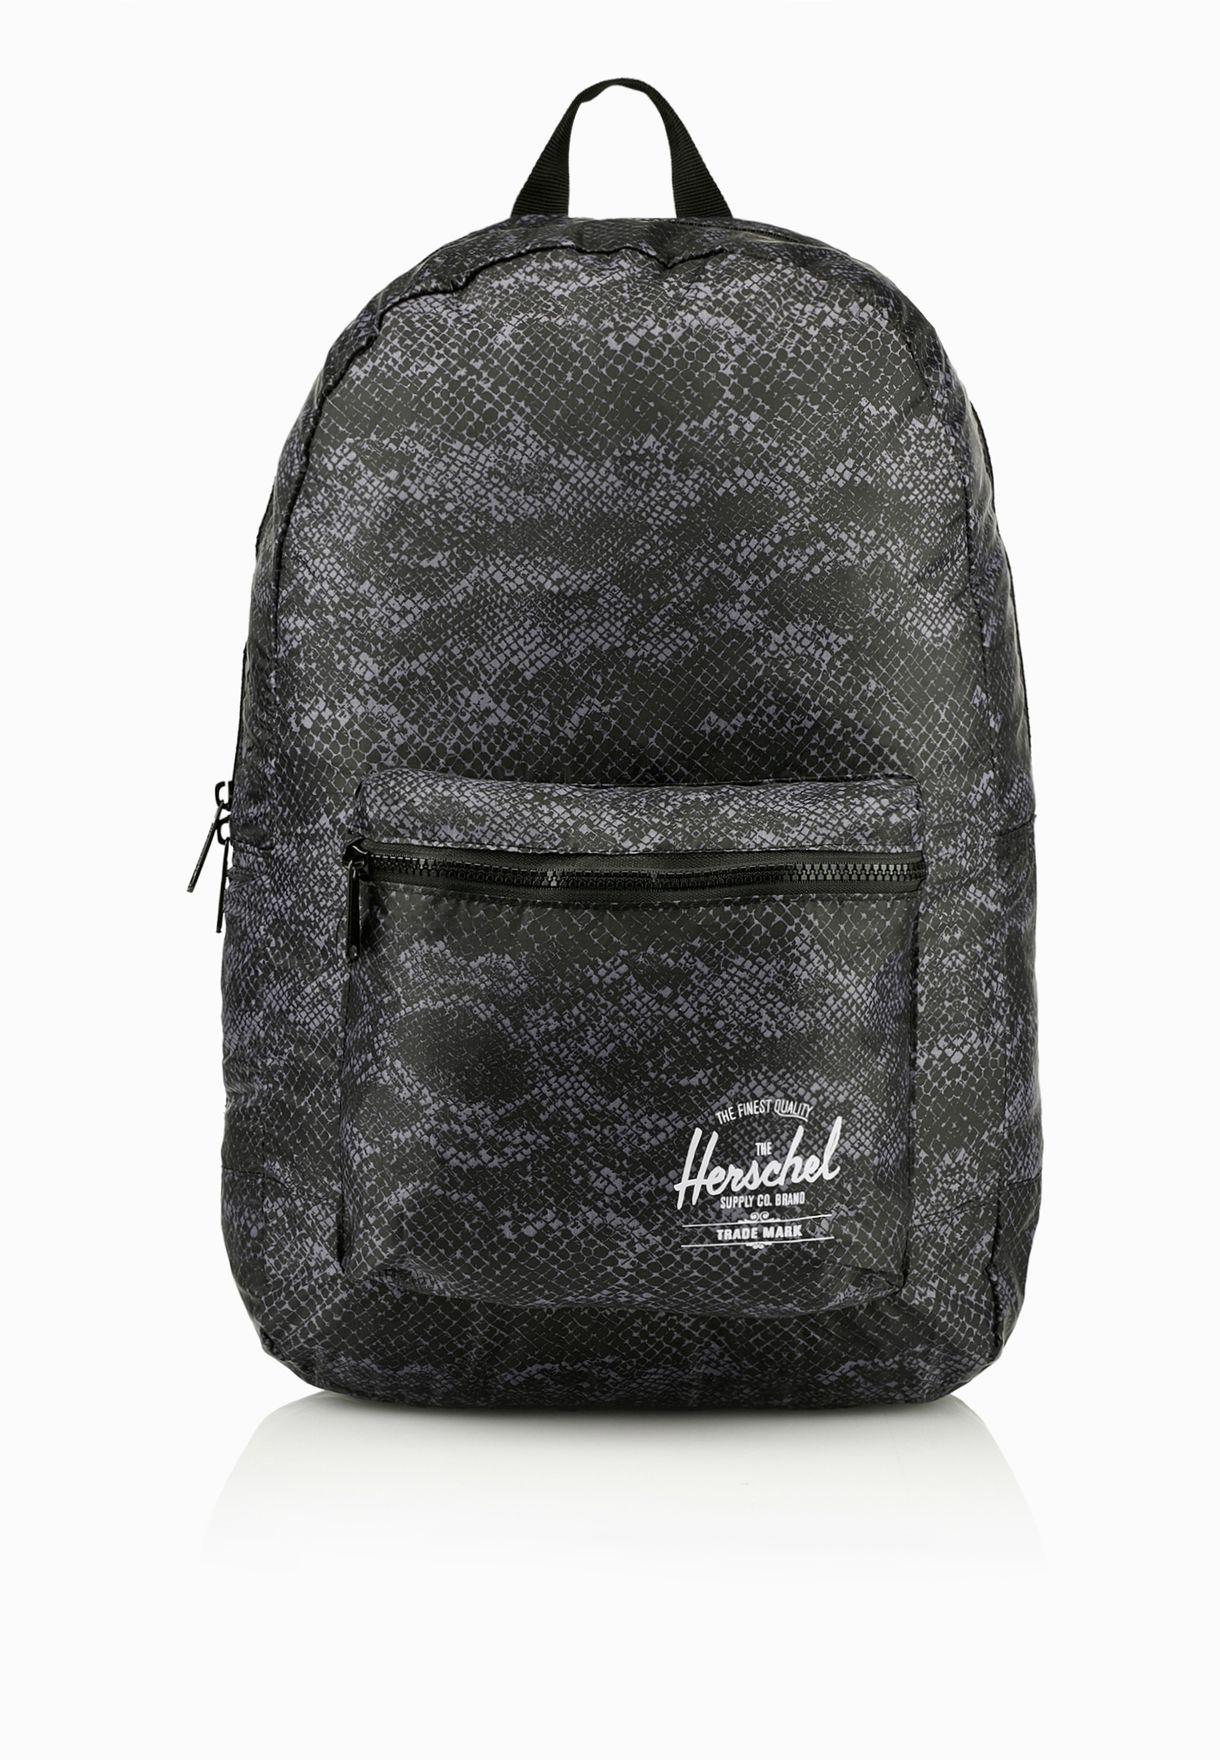 45394618a5e9 Shop Herschel prints Packable Daypack for Women in Qatar - HE829AC51OWE